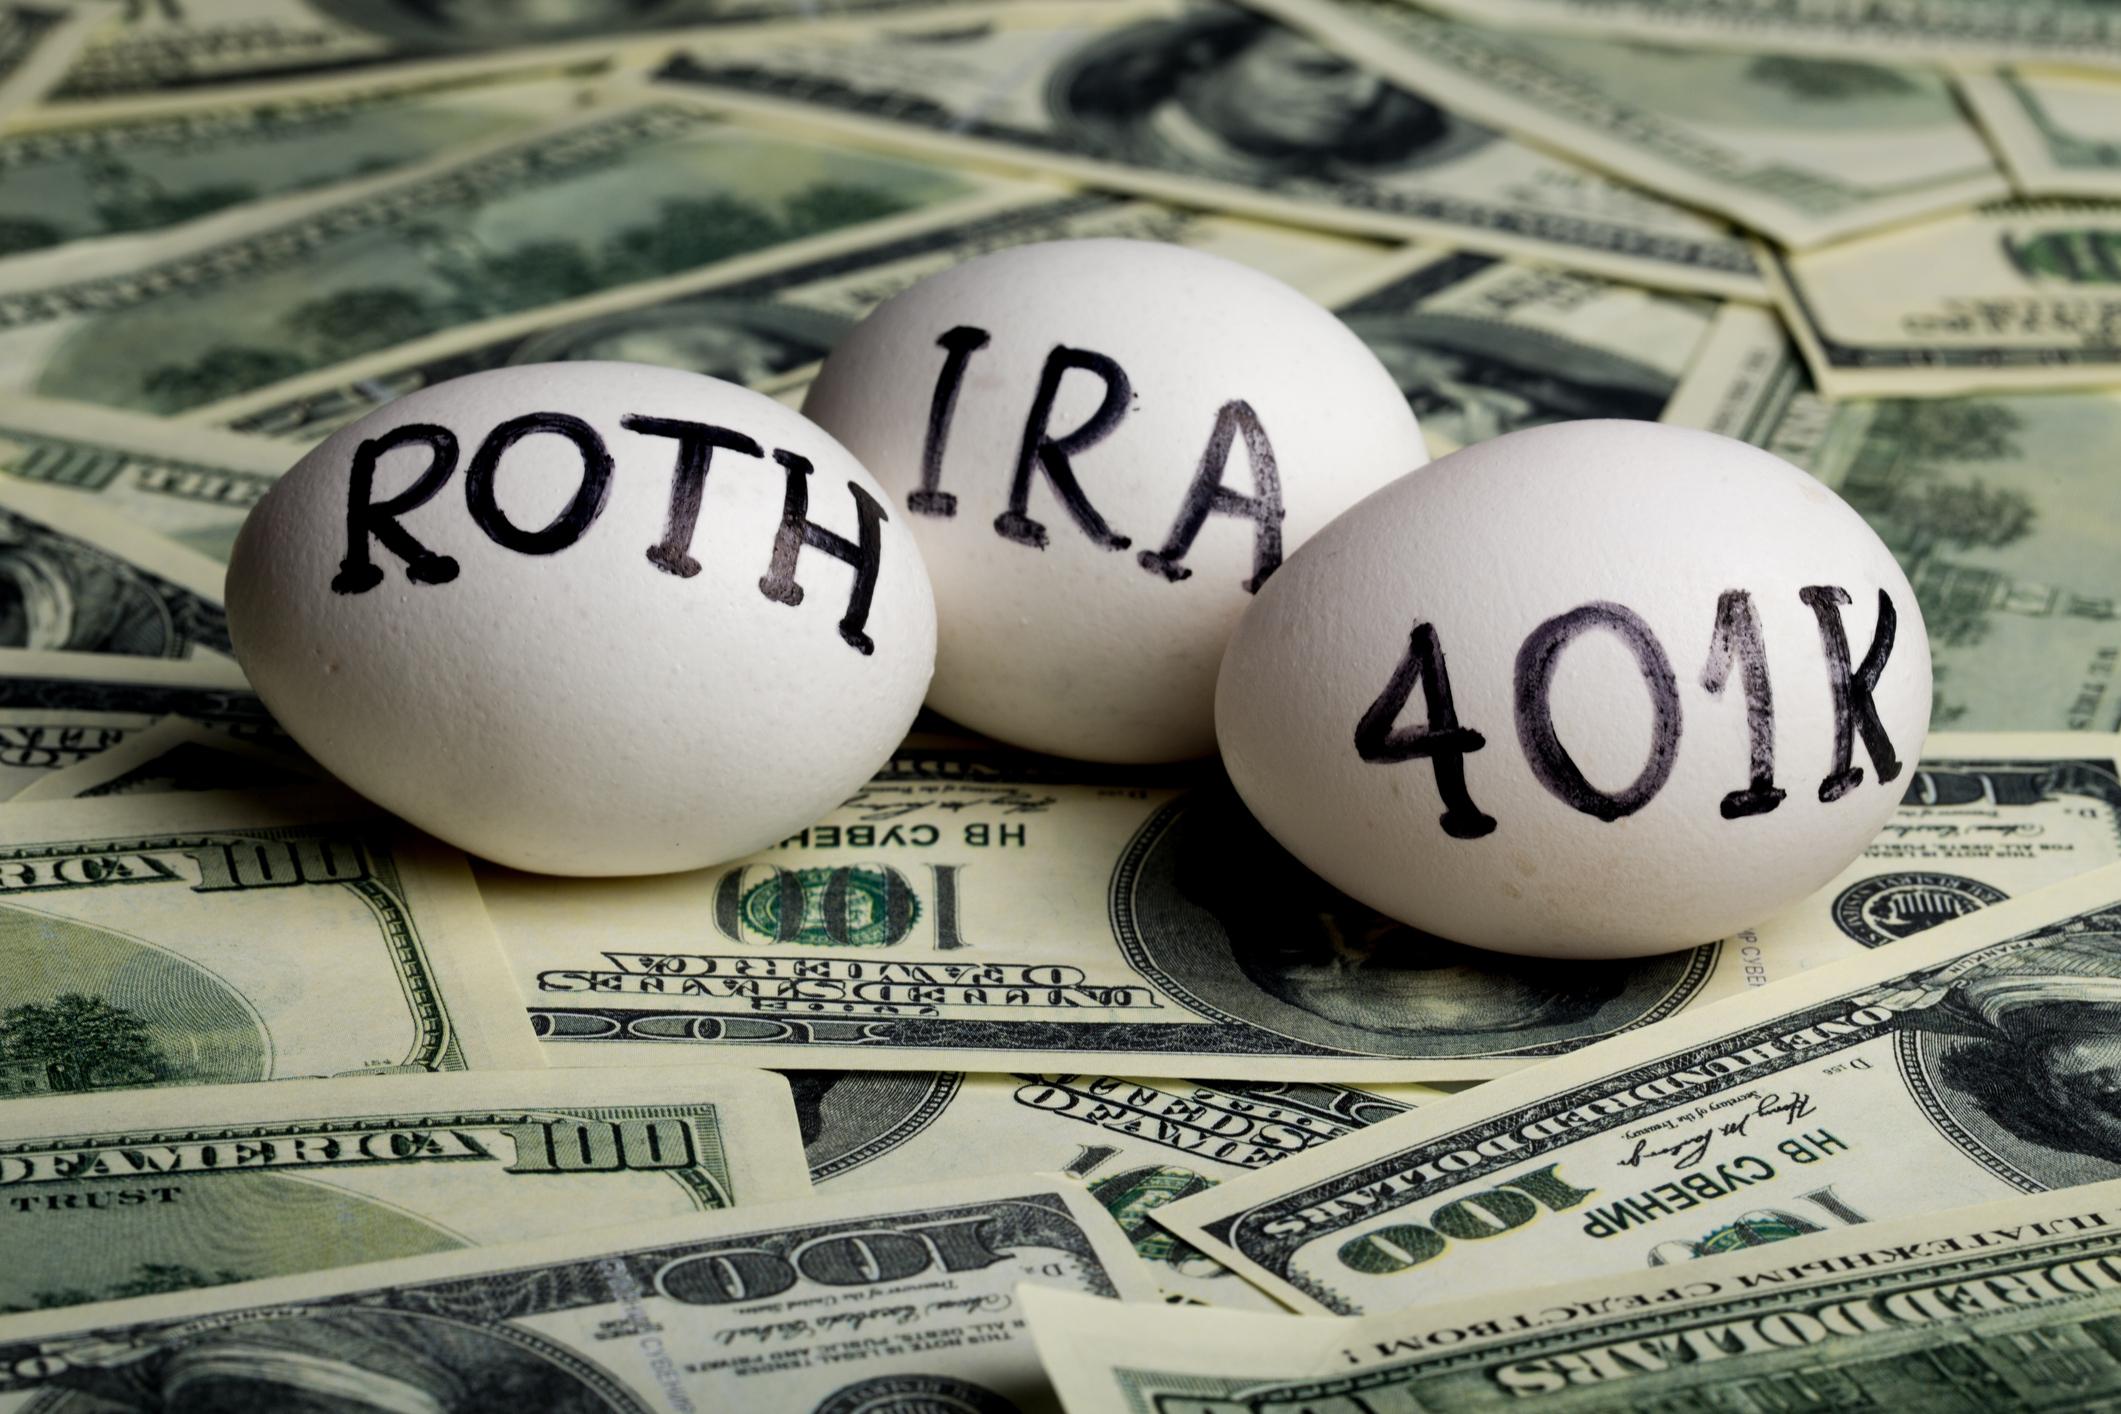 Three eggs, labeled Roth, IRA, 401k, on $100 bills.